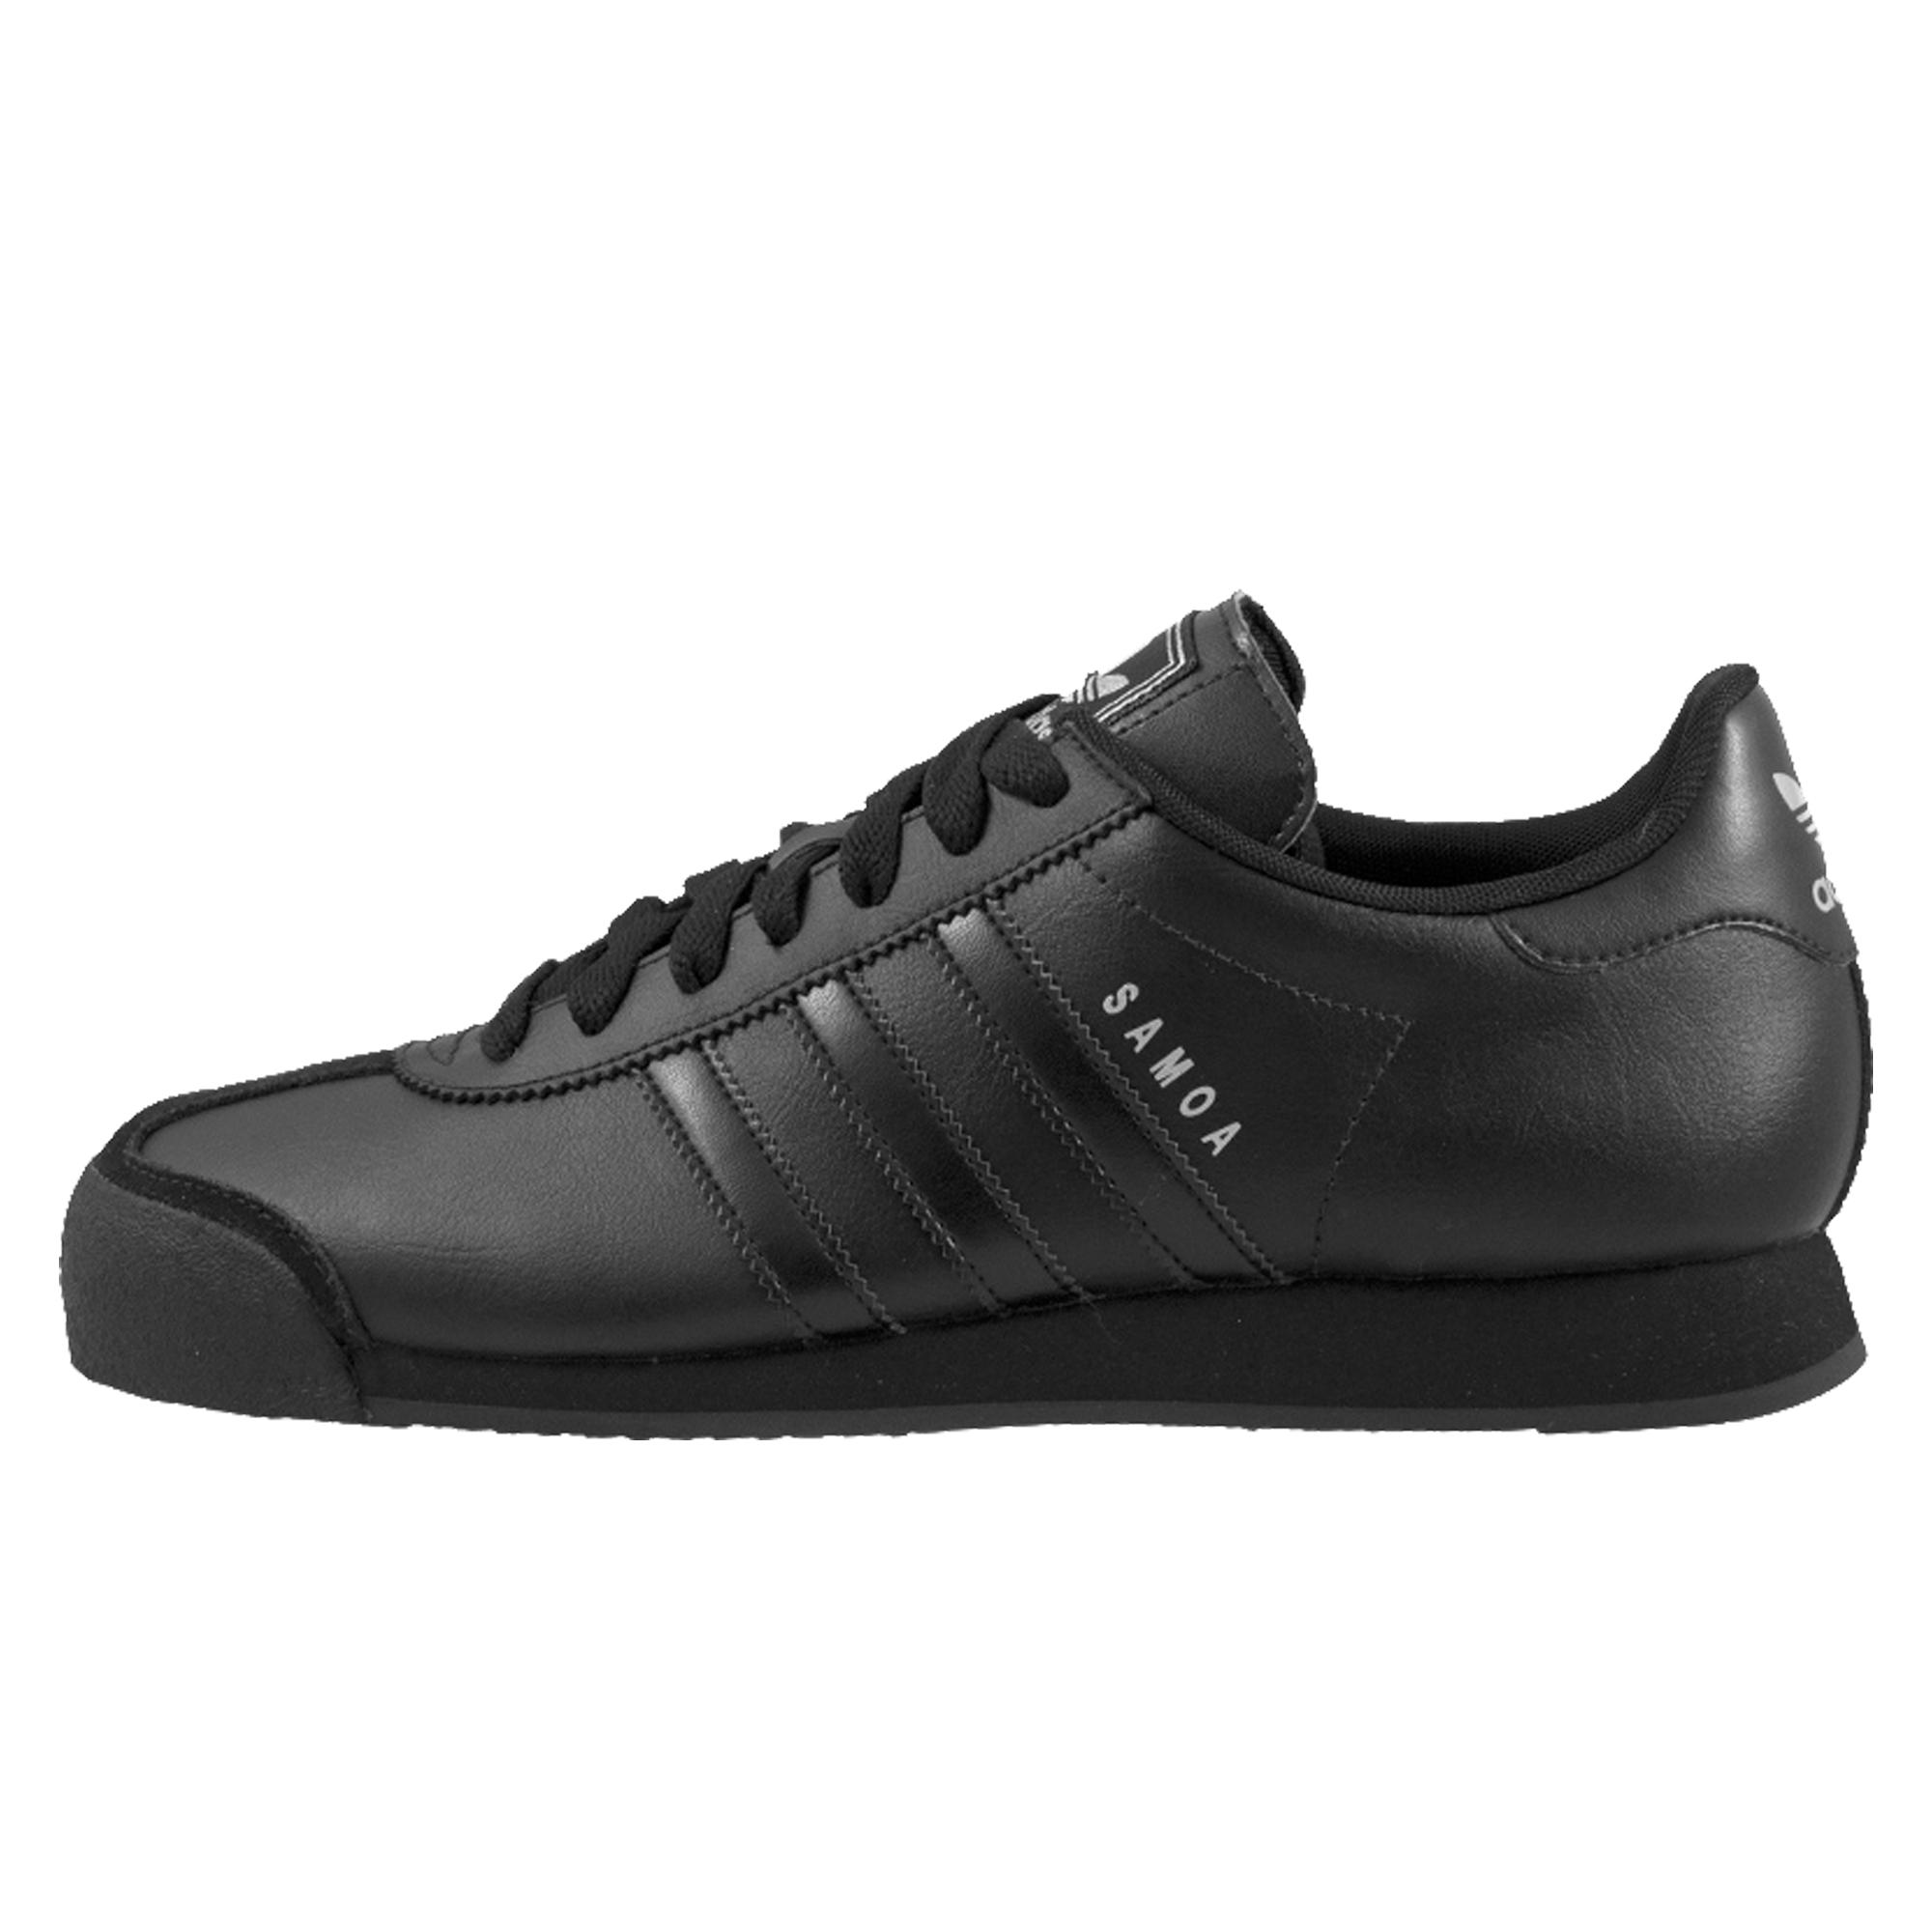 adidas samoa erkek ayakkab? modelleri